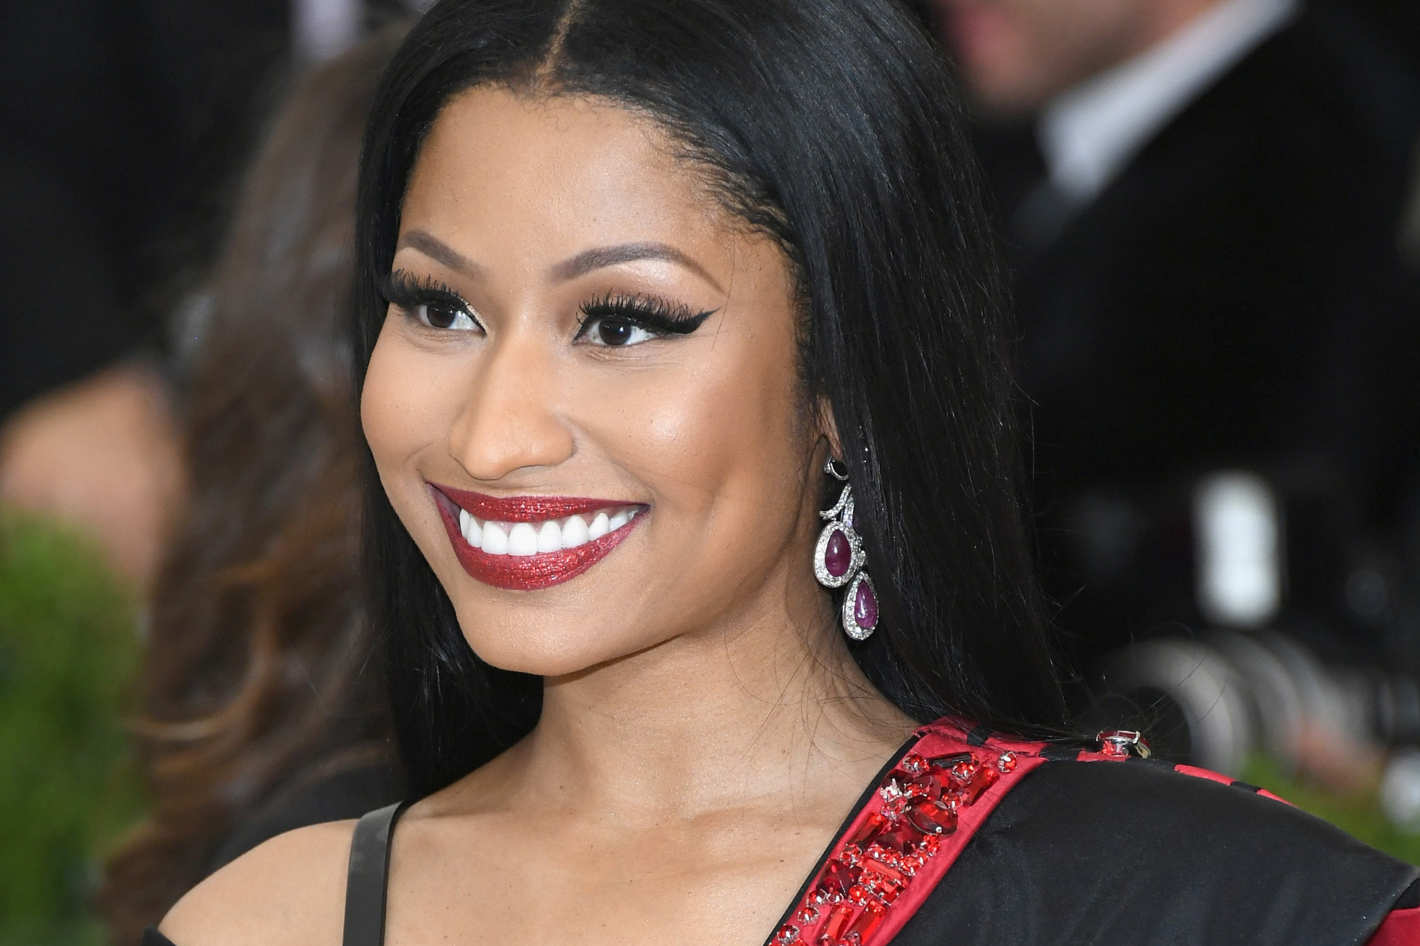 Nicki Minaj Credits Herself For 'Reintroducing' Female Rappers to The Mainstream